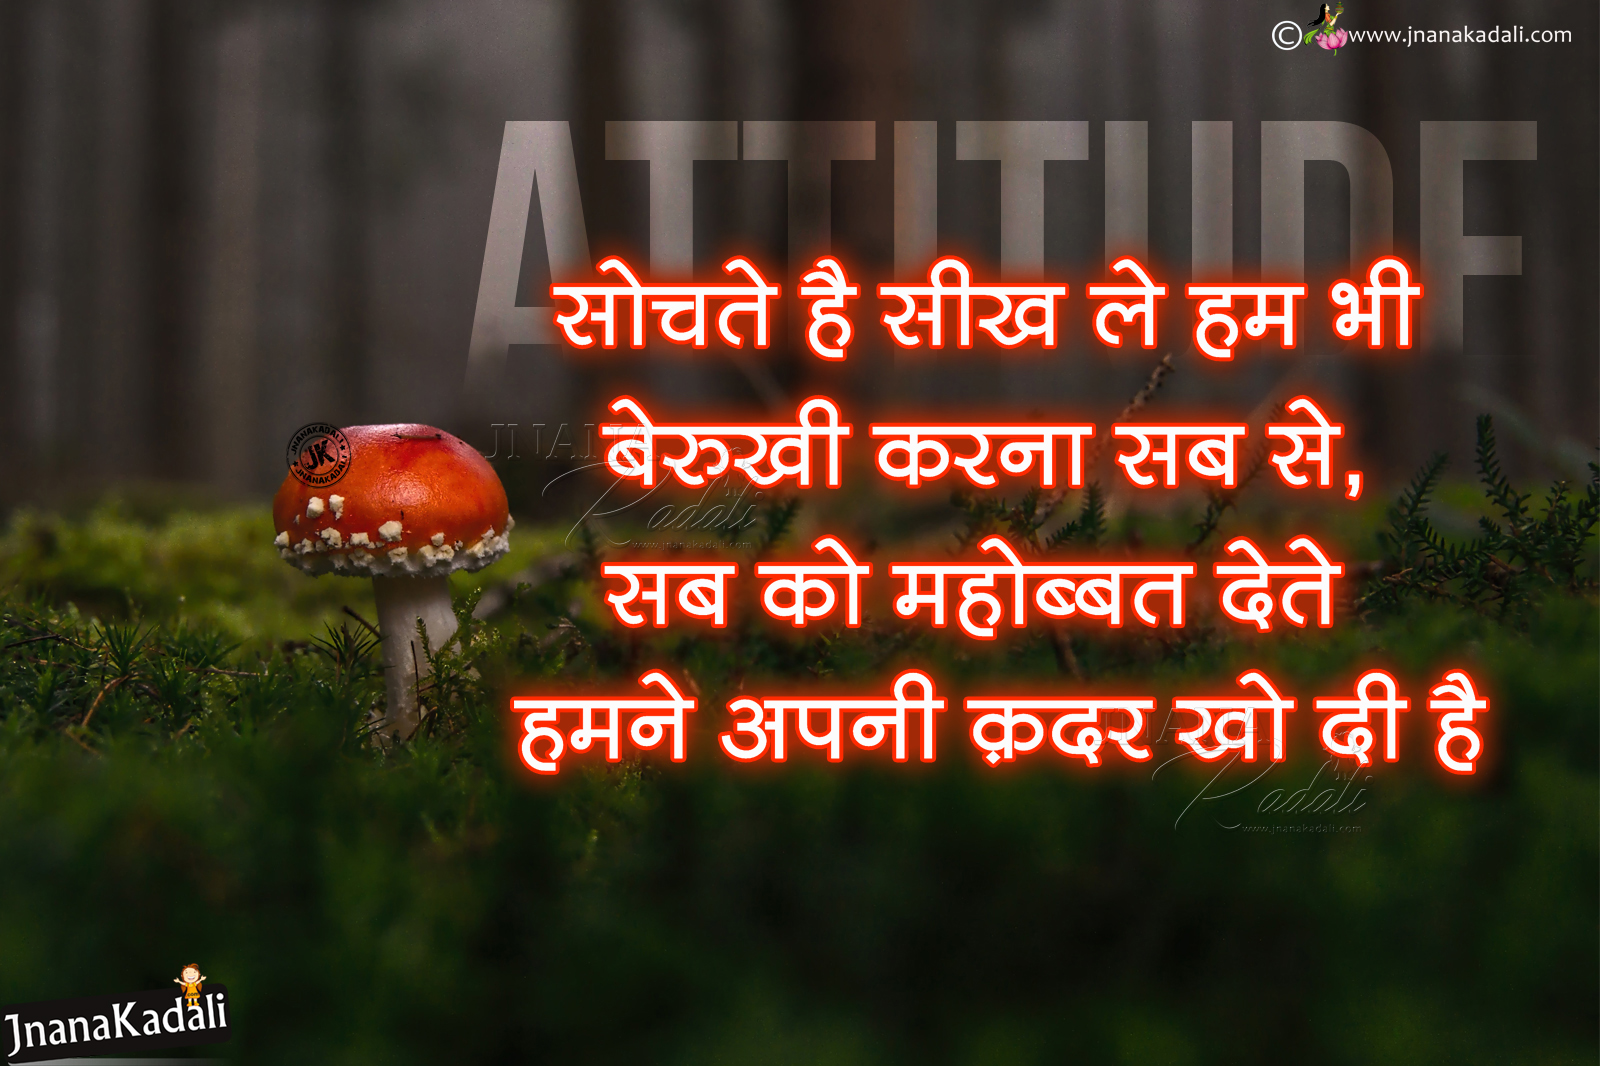 Famous Hindi Attitude Quotes-Motivational Goal Reaching